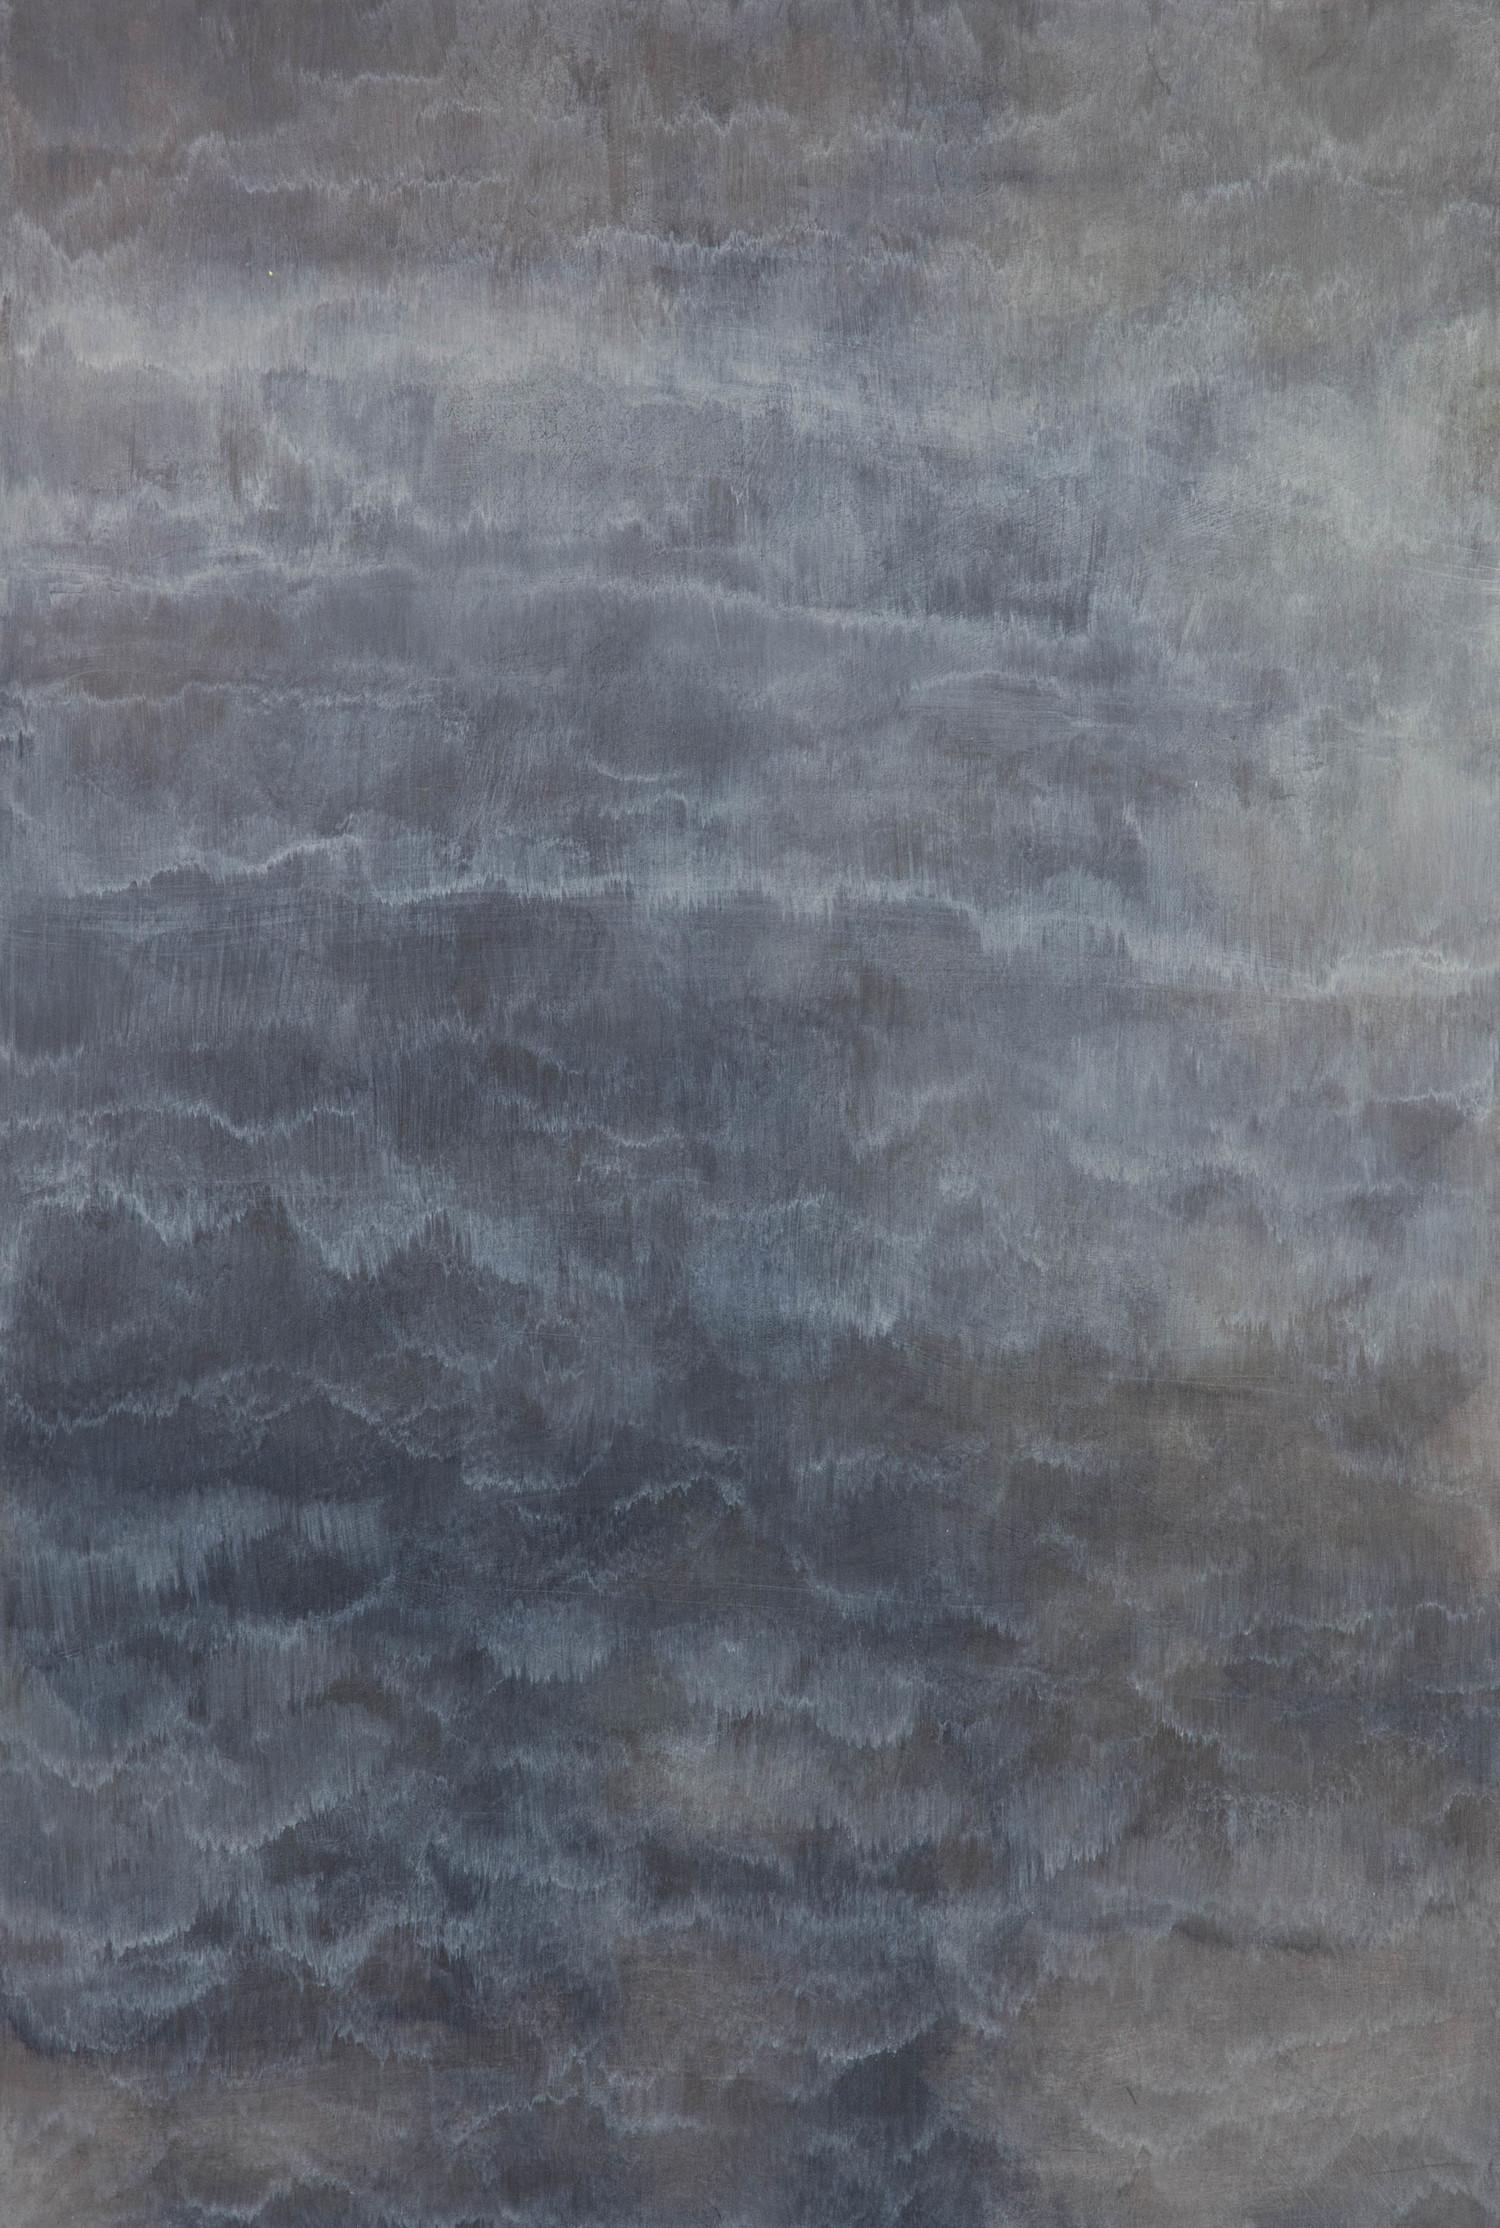 Untitled , Acrylic on wood panel, 60 x 90 cm, 2014